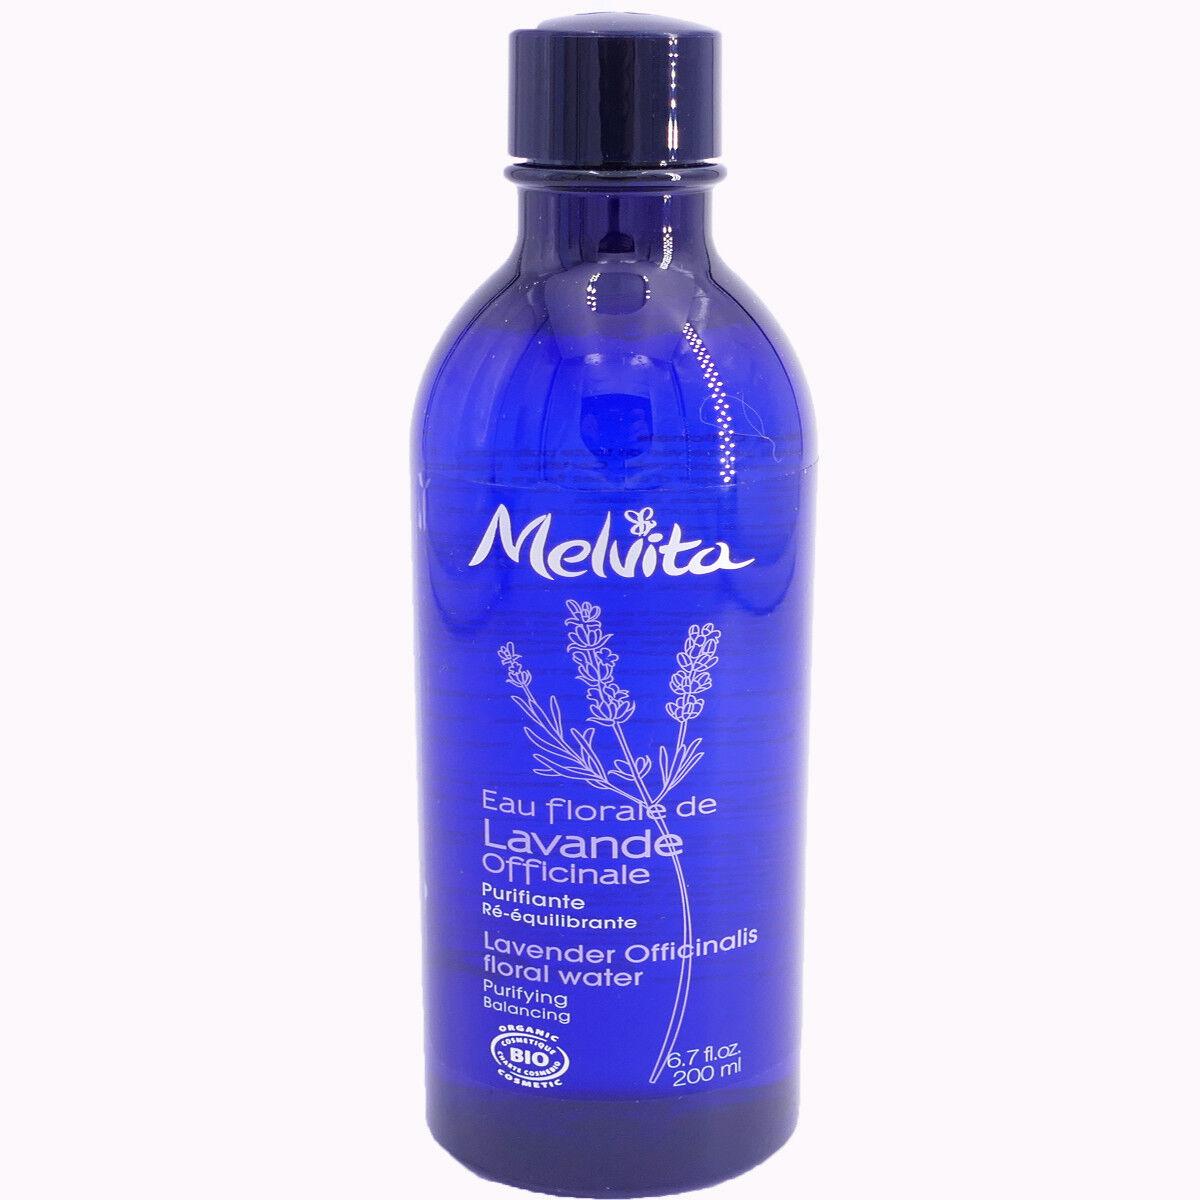 Melvita eau florale de lavande bio 200 ml